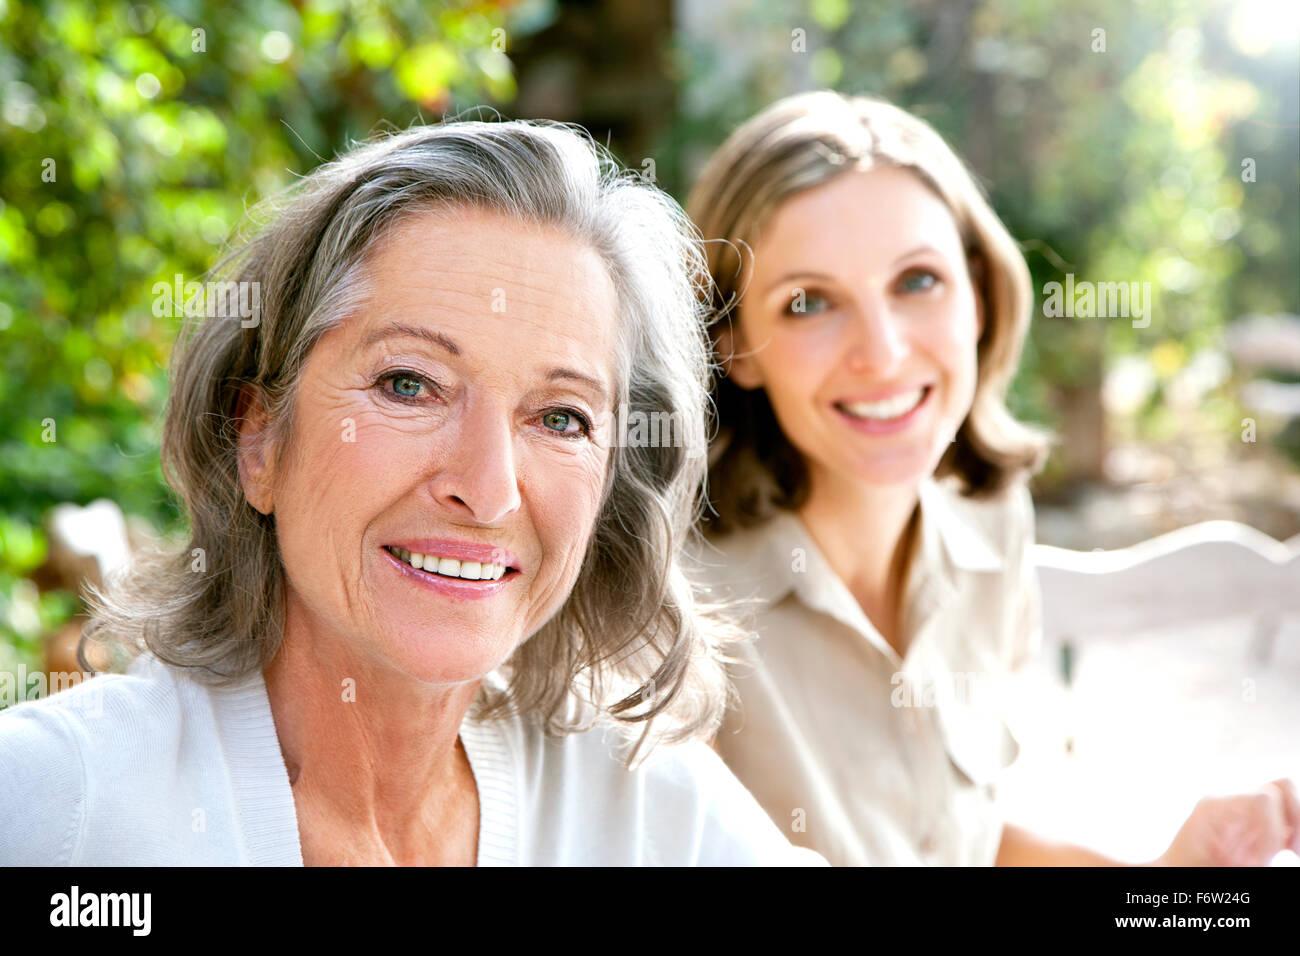 mature woman vs young woman